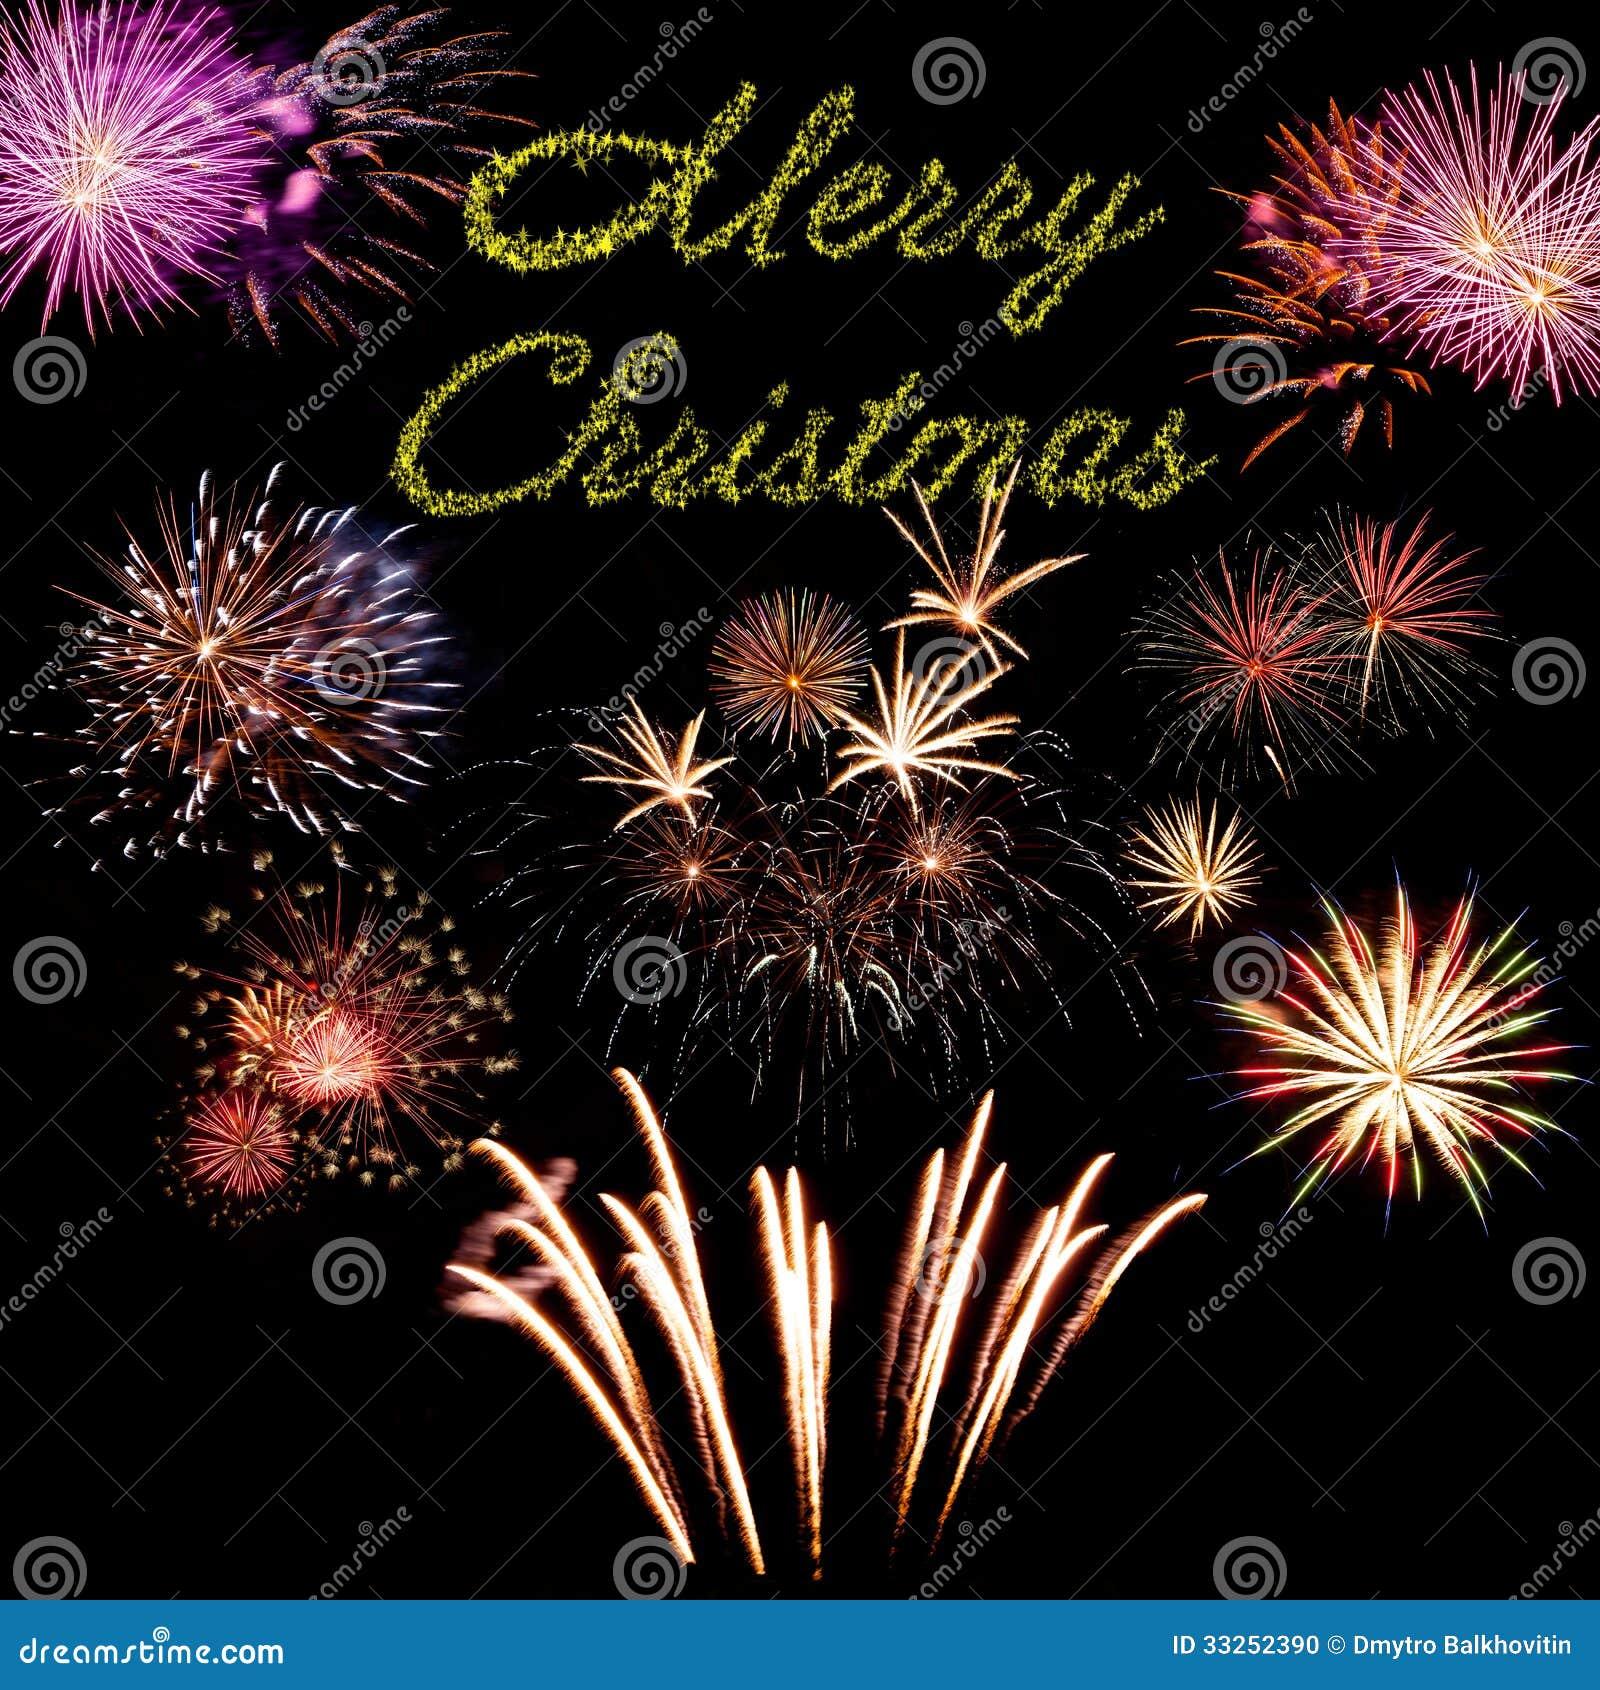 Merry Christmas Holiday Card Stock Photo - Image: 33252390